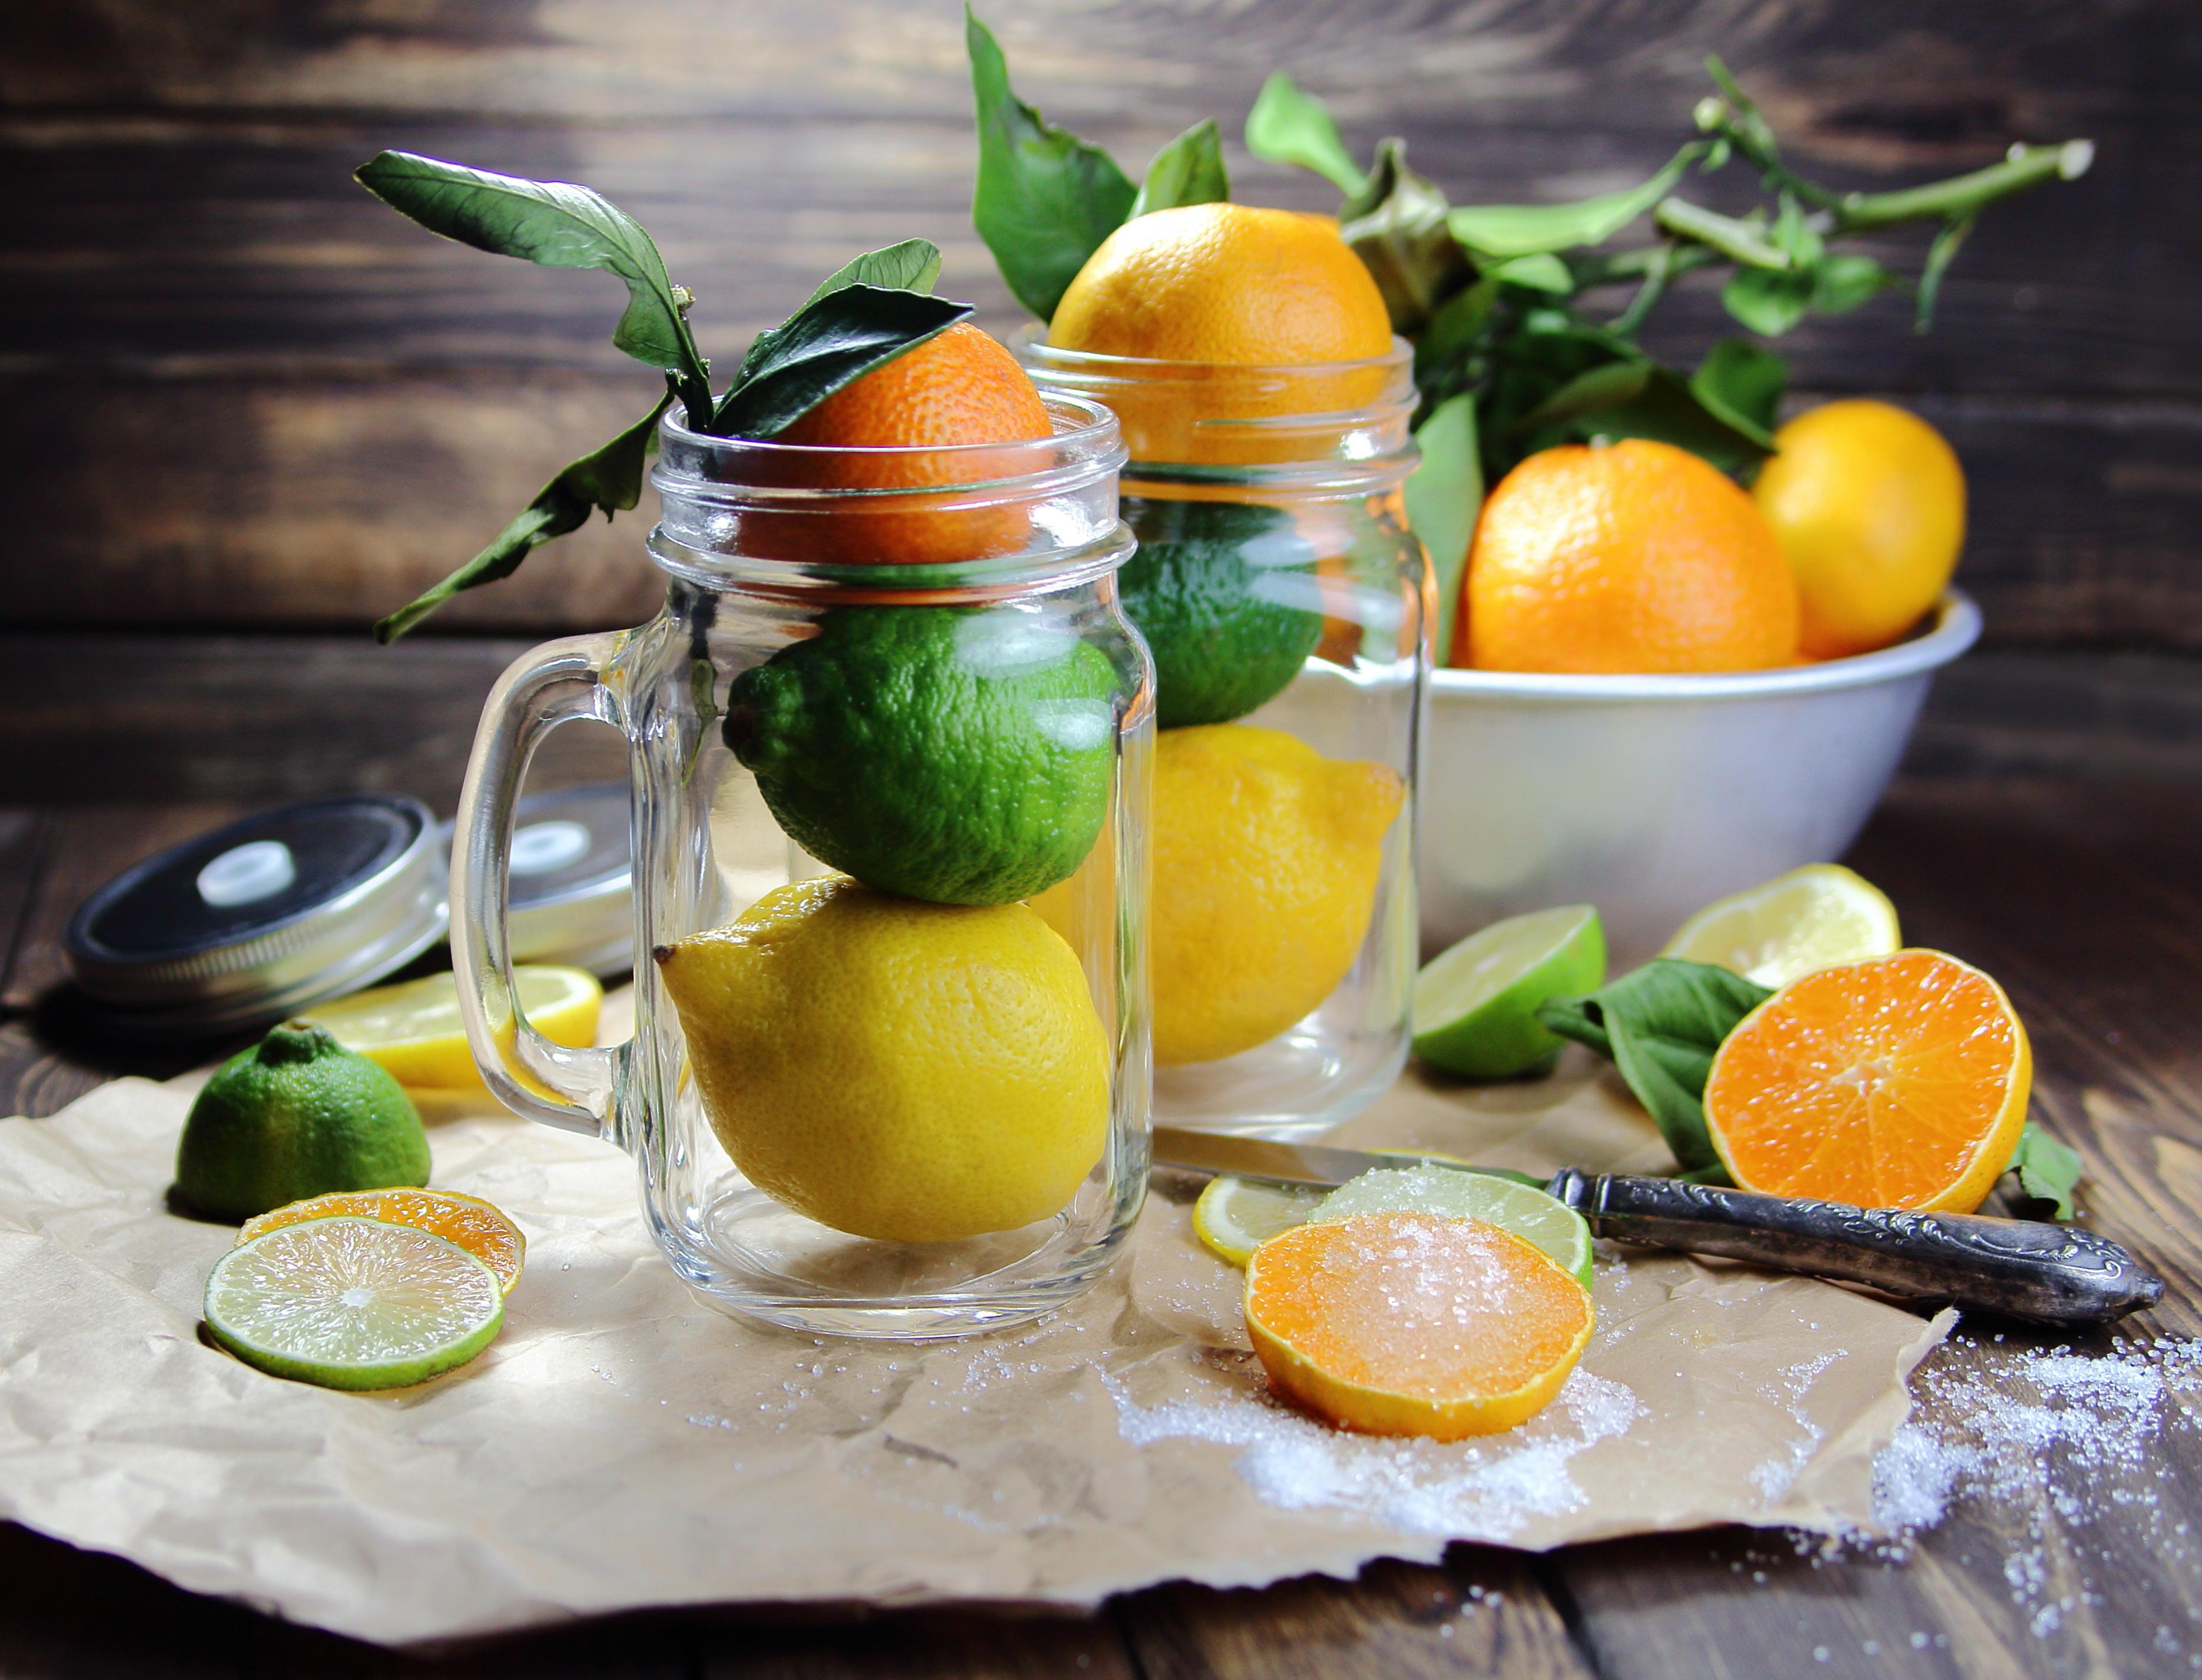 обои цитрусовые, мандарины, лайм, лимон картинки фото